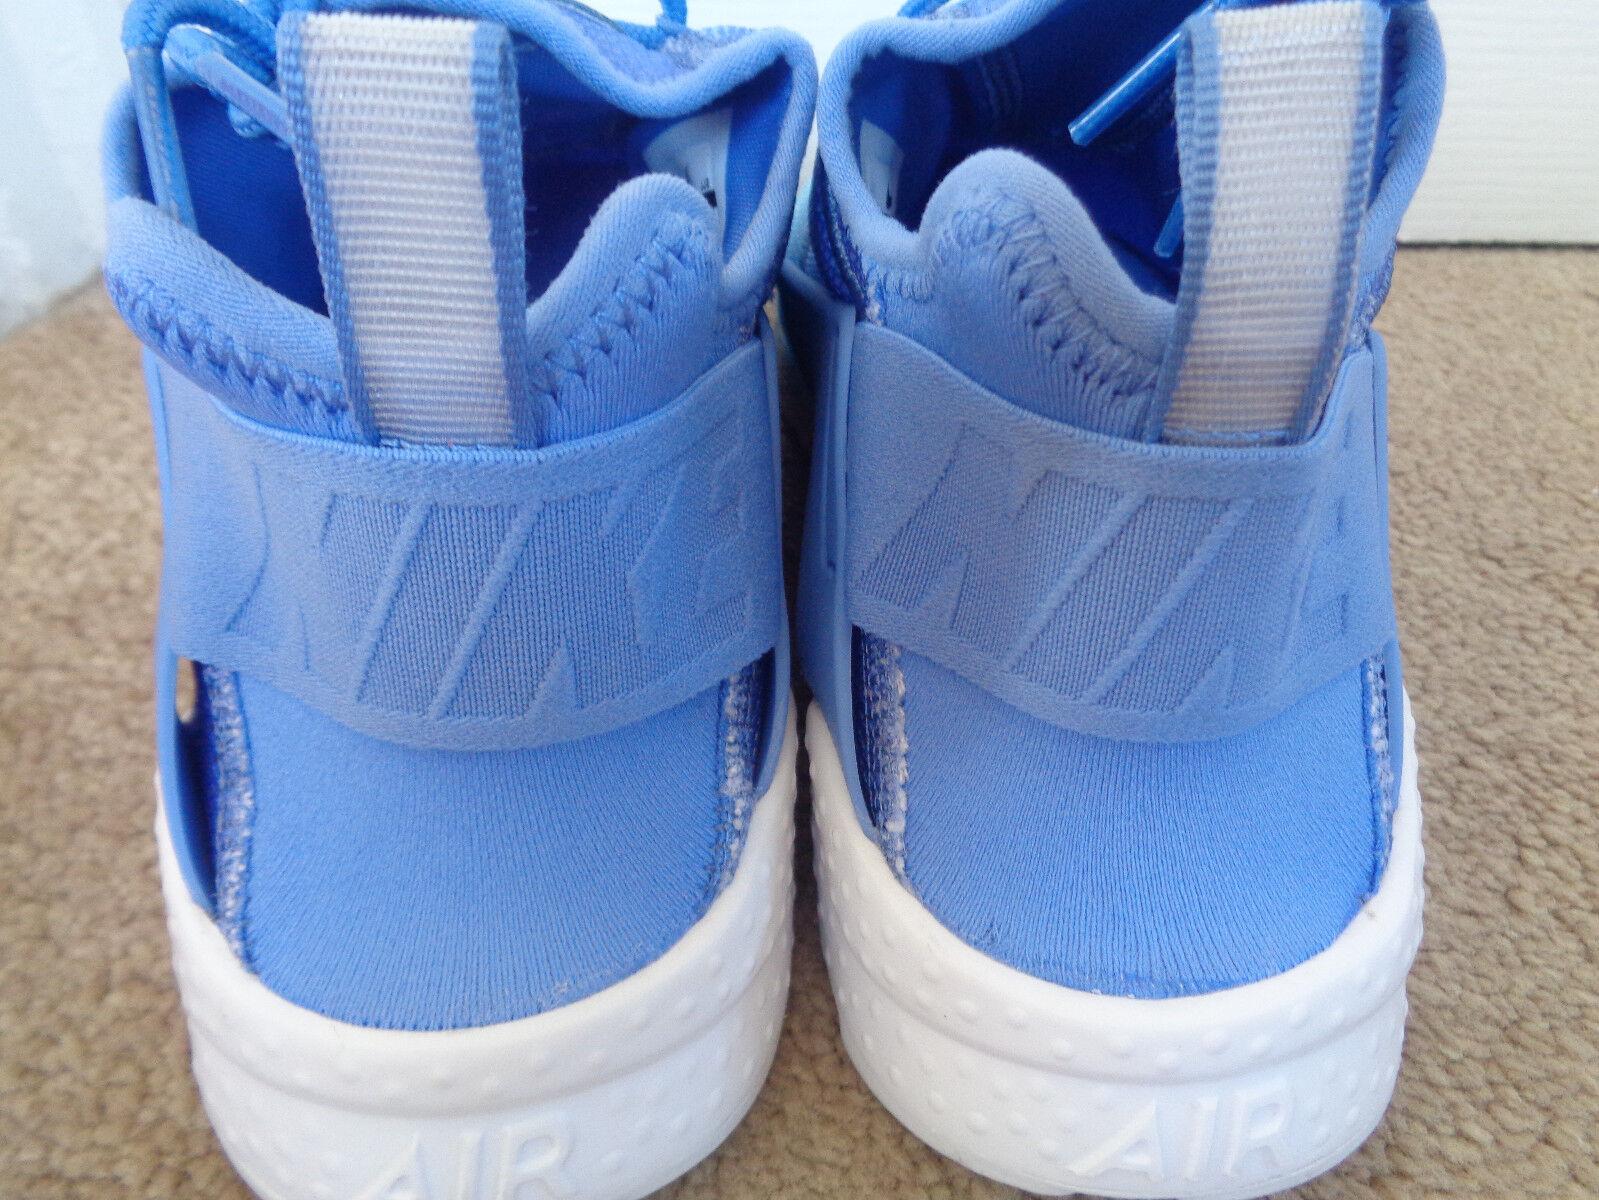 Nike Air Huarache Run Ultra BR trainers 833292 401 4.5 uk 4.5 401 eu 38 us 7 NEW+BOX 3ba15e